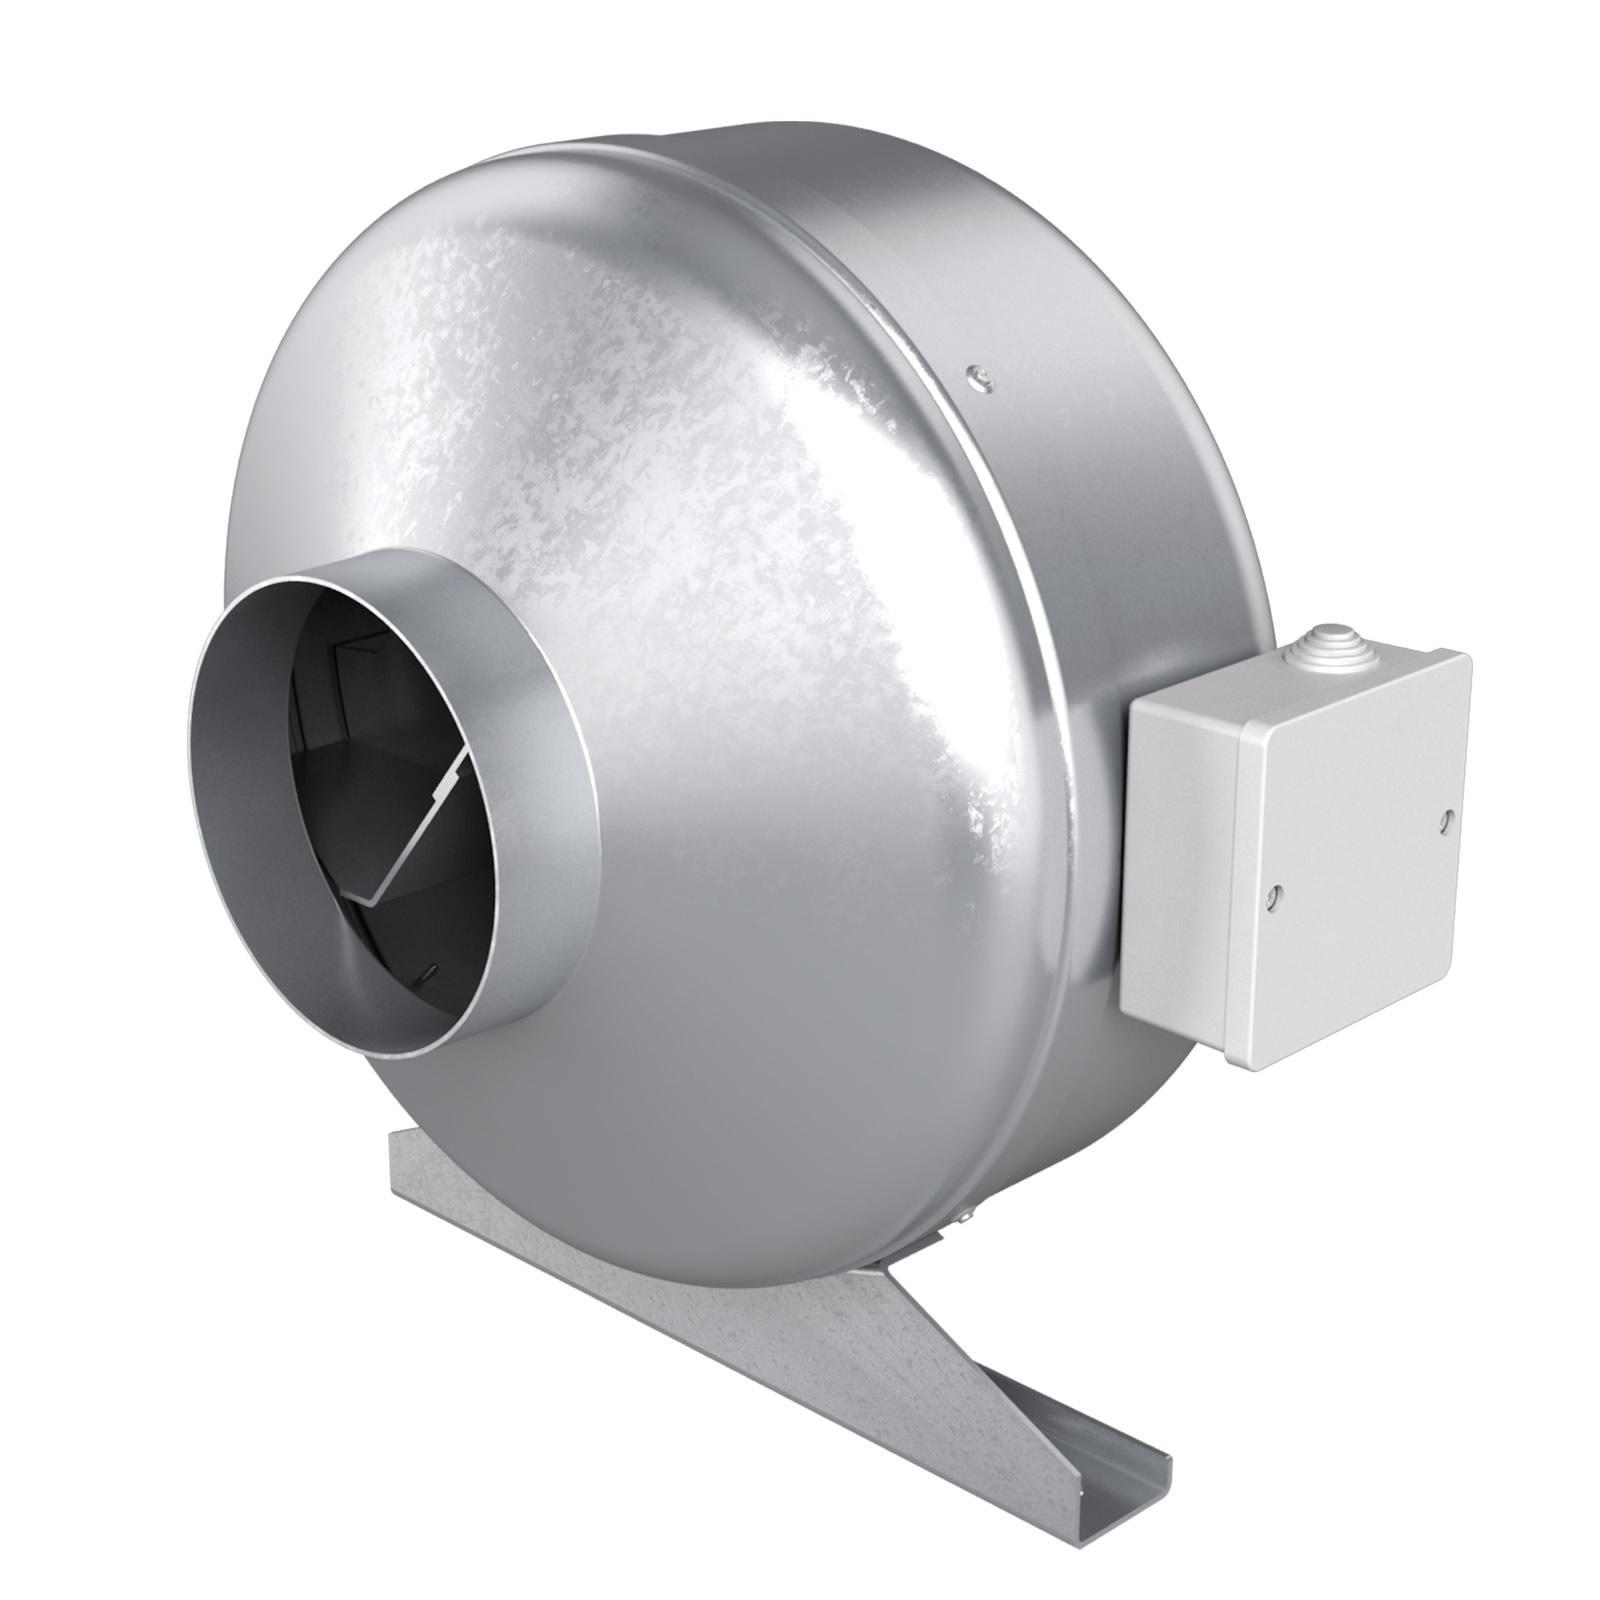 Канальный центробежный вентилятор Era Mars gdf 100 era mars gdf 150 вентилятор центробежный канальный